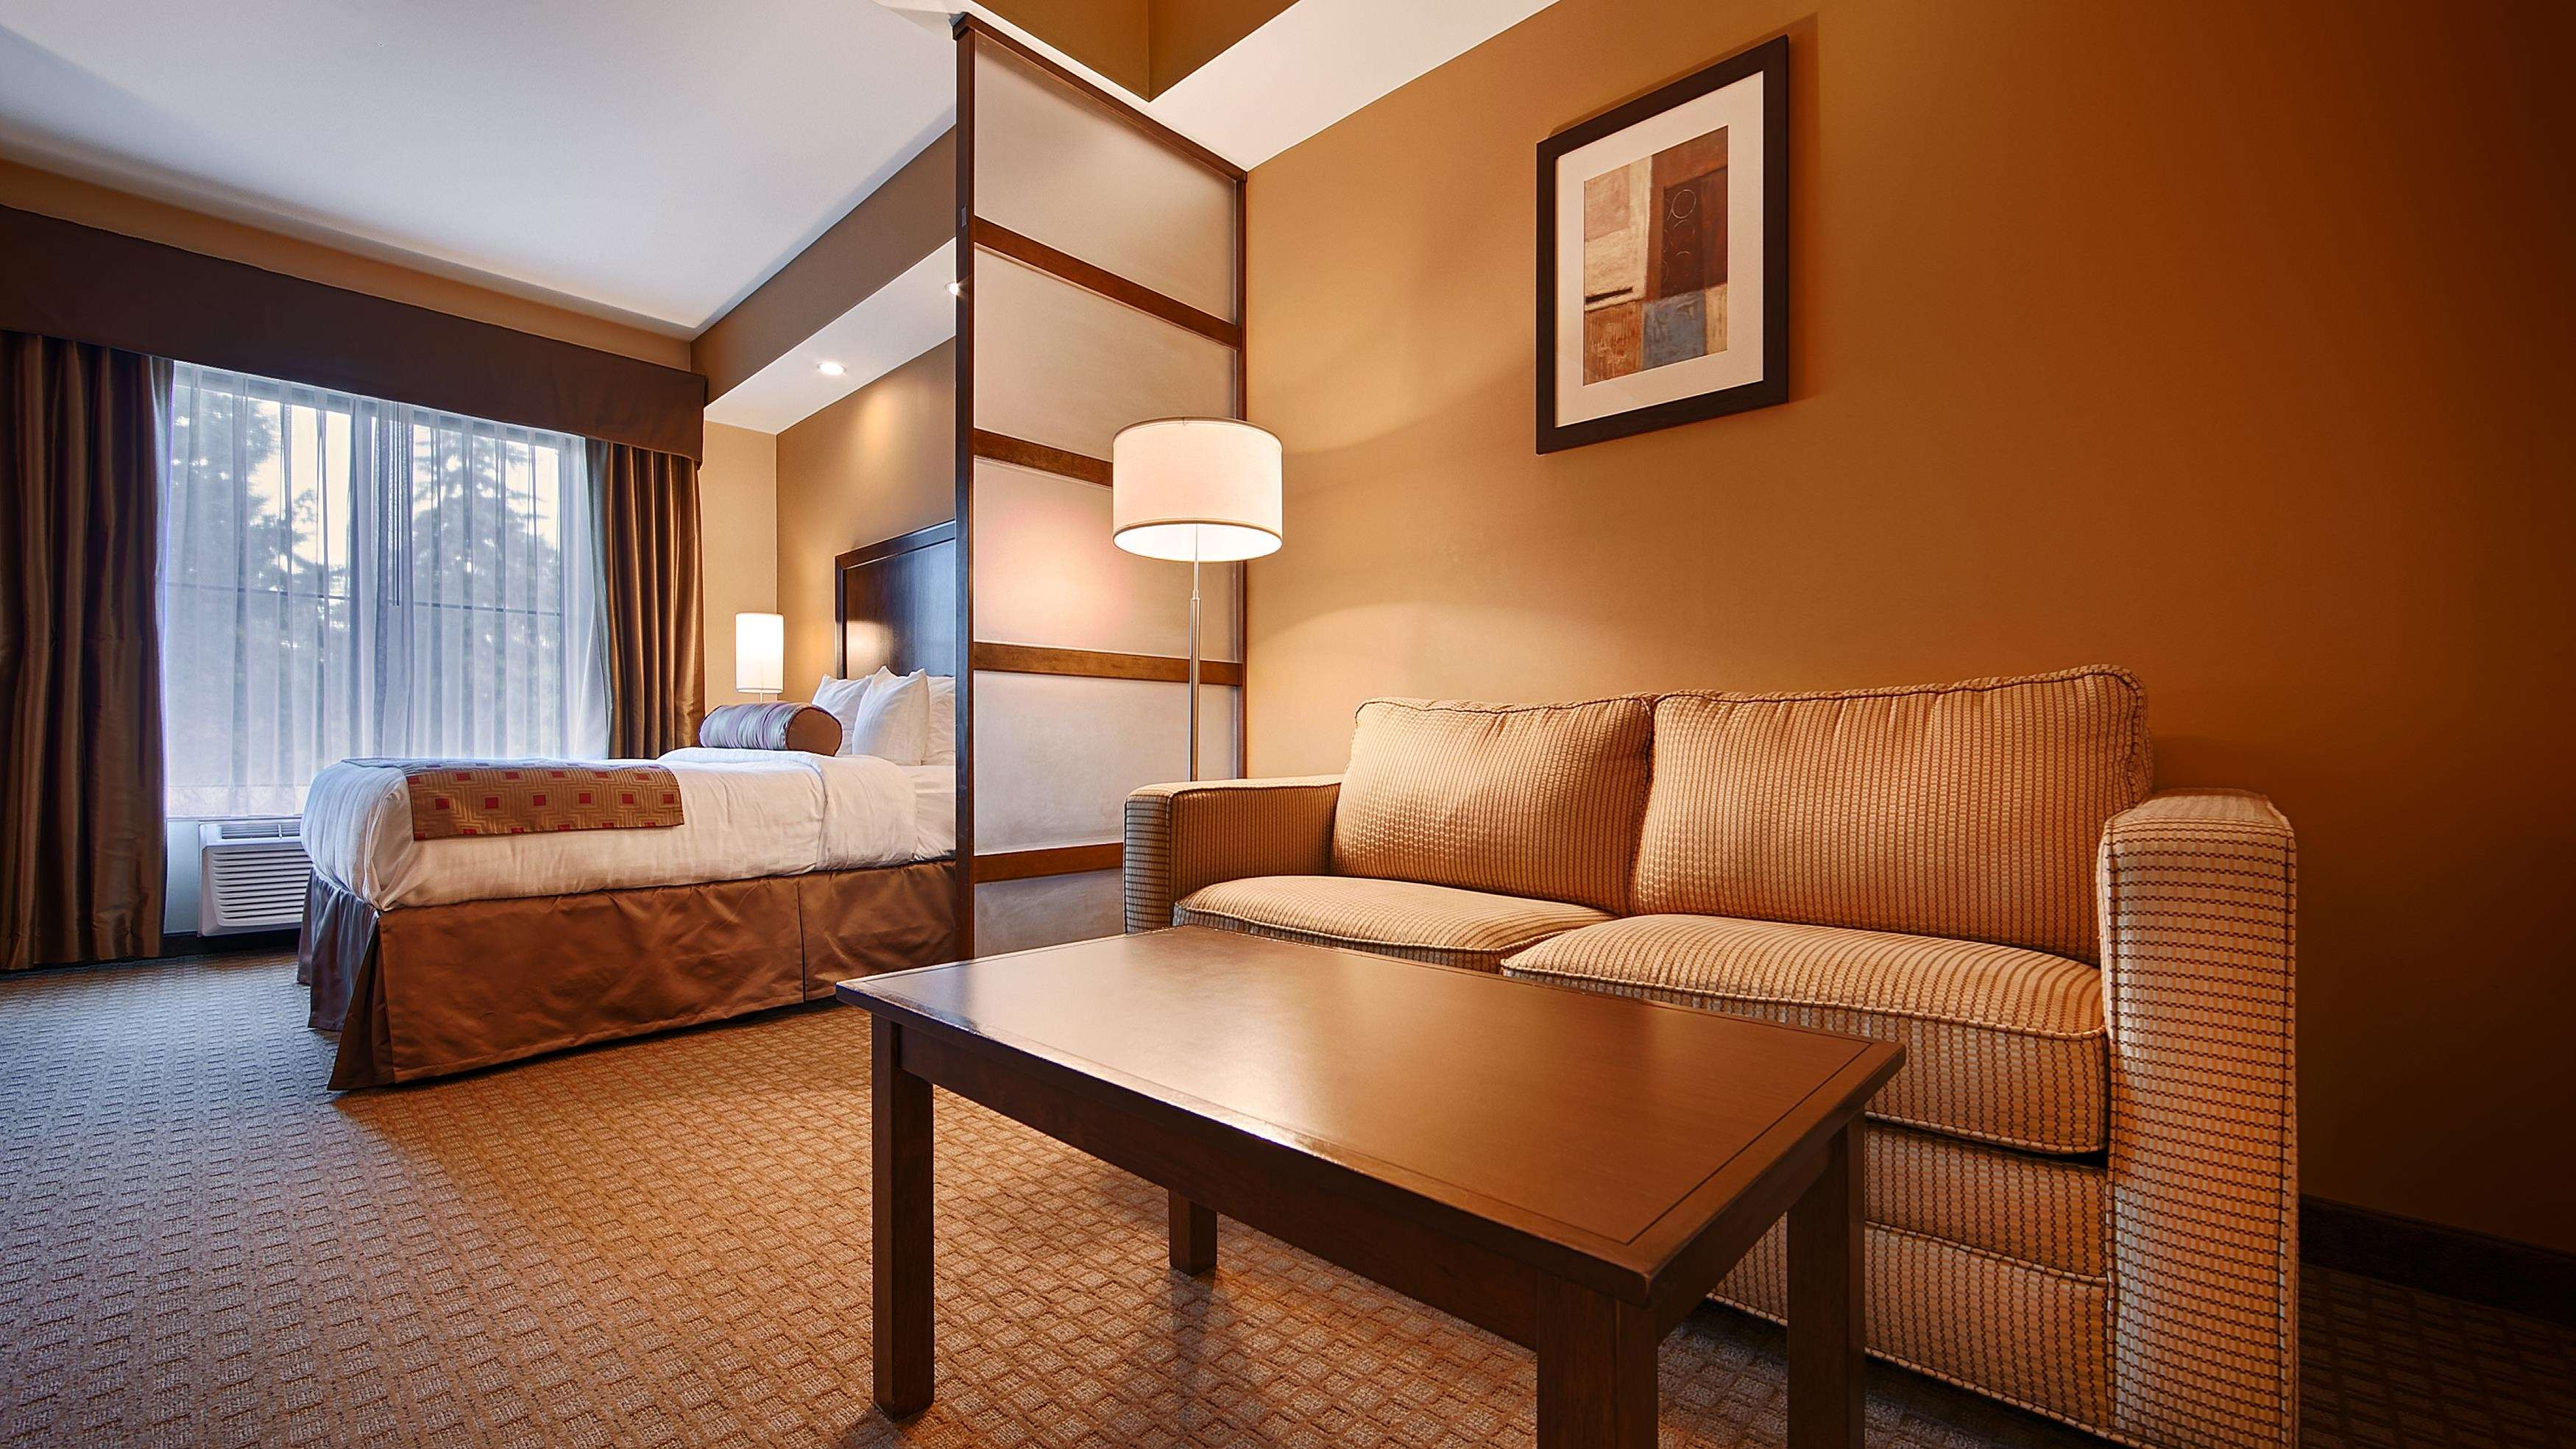 Best Western Plus Lacey Inn & Suites image 15